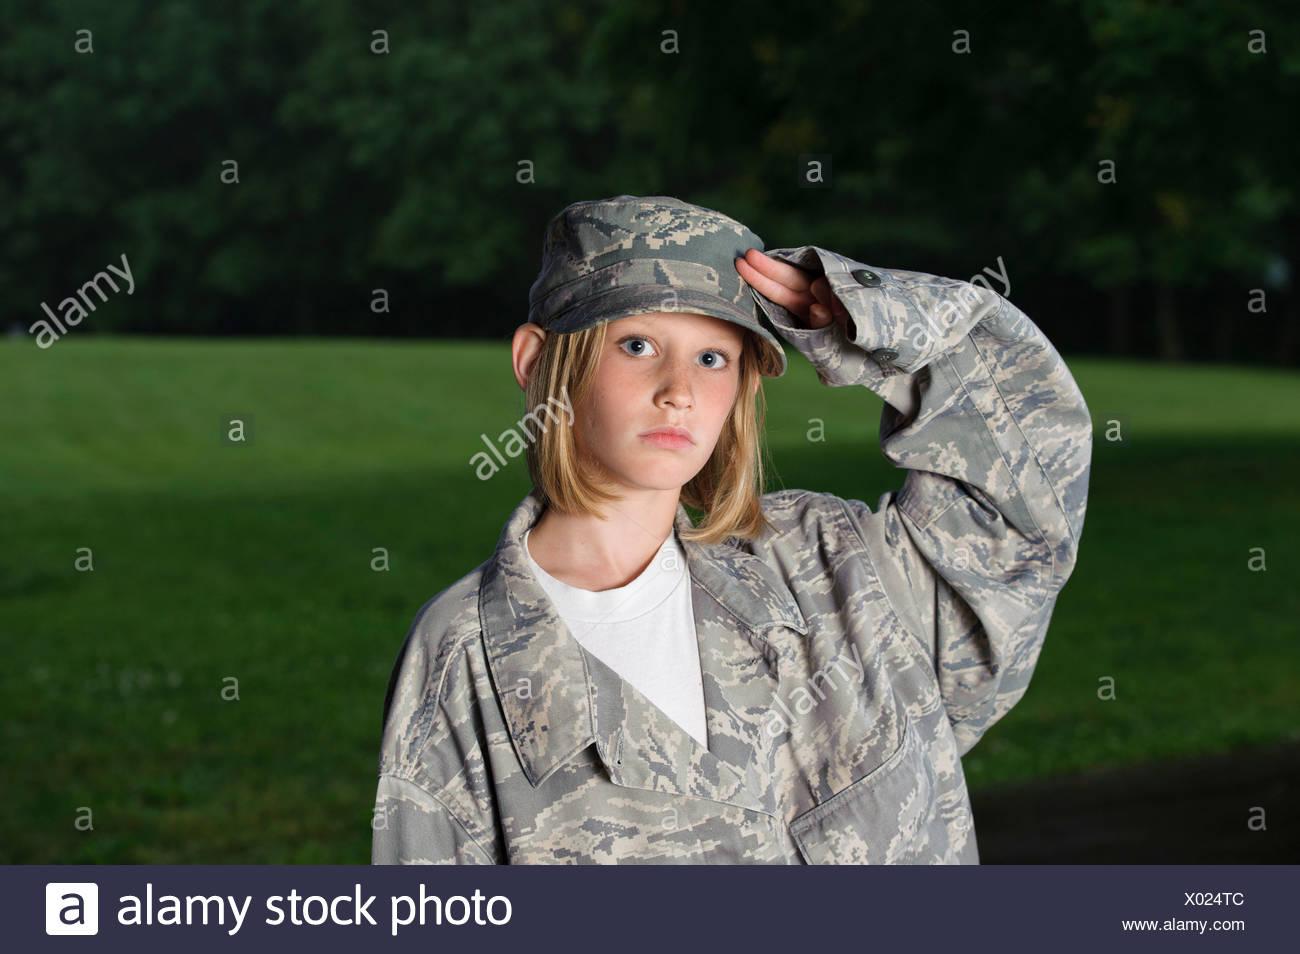 Veste militaire petite fille